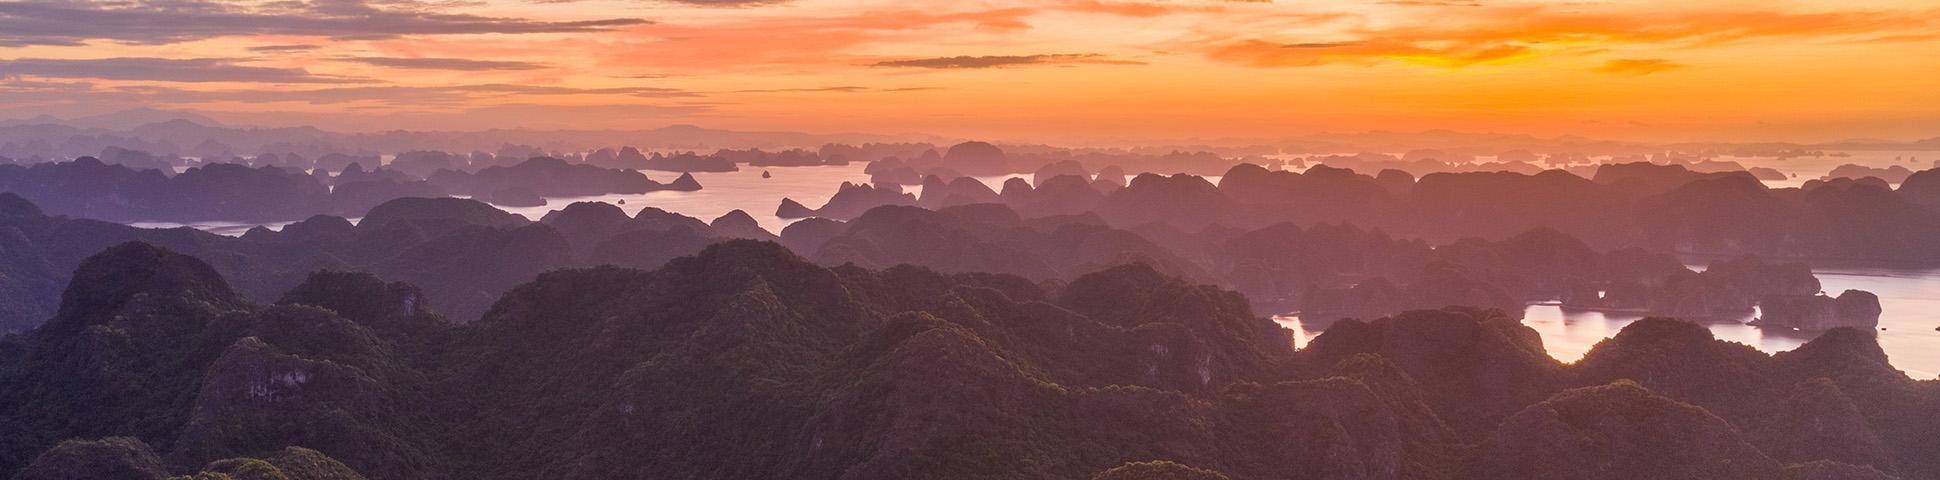 Northern Vietnam Hiking Tour